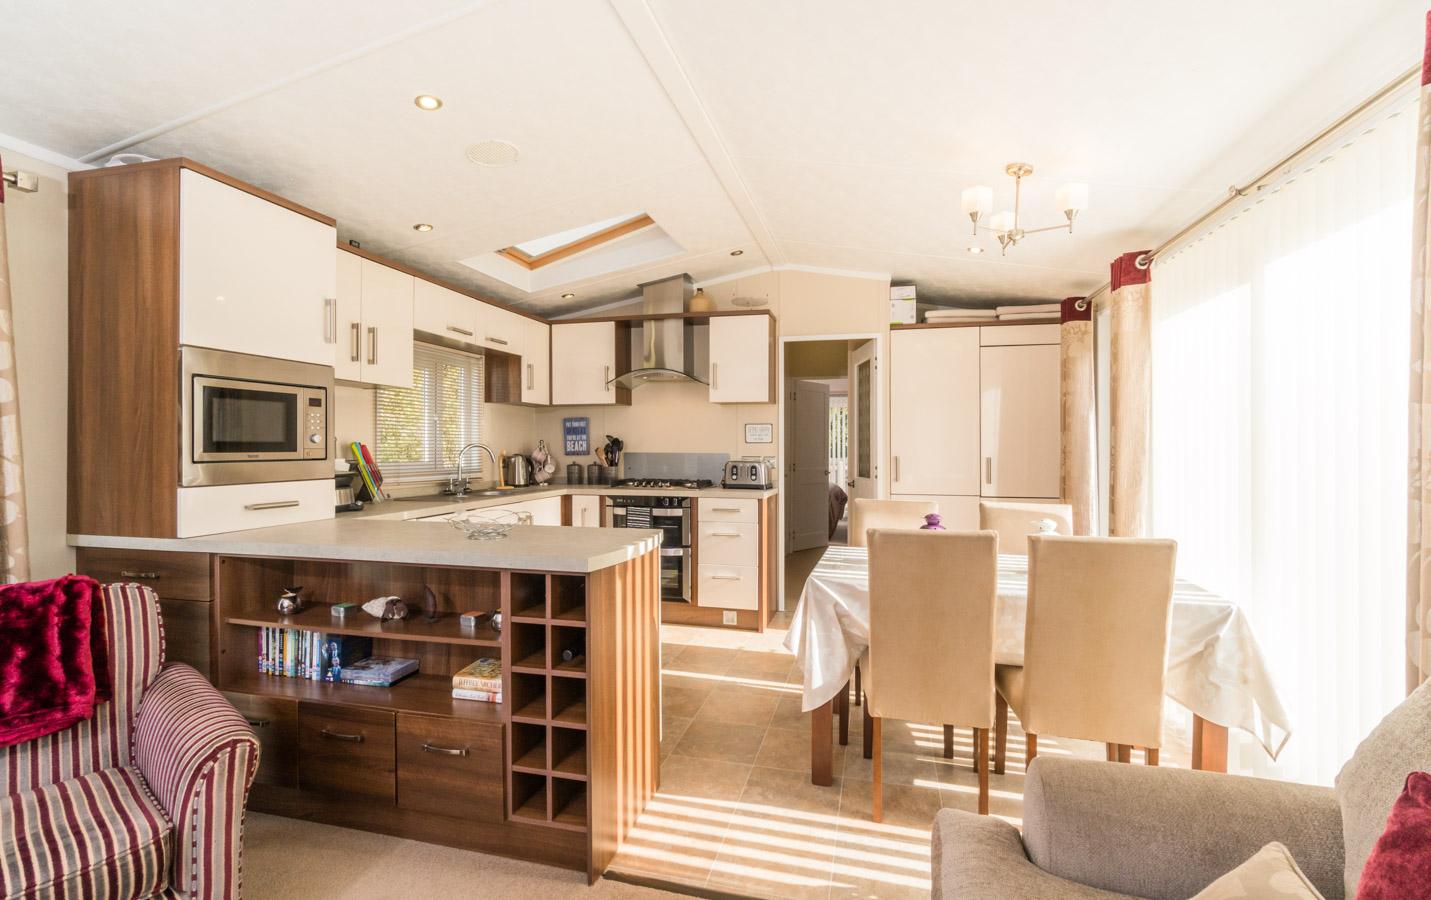 Neil-Bigwood-Monkton-Wyld-Holiday-Homes-47